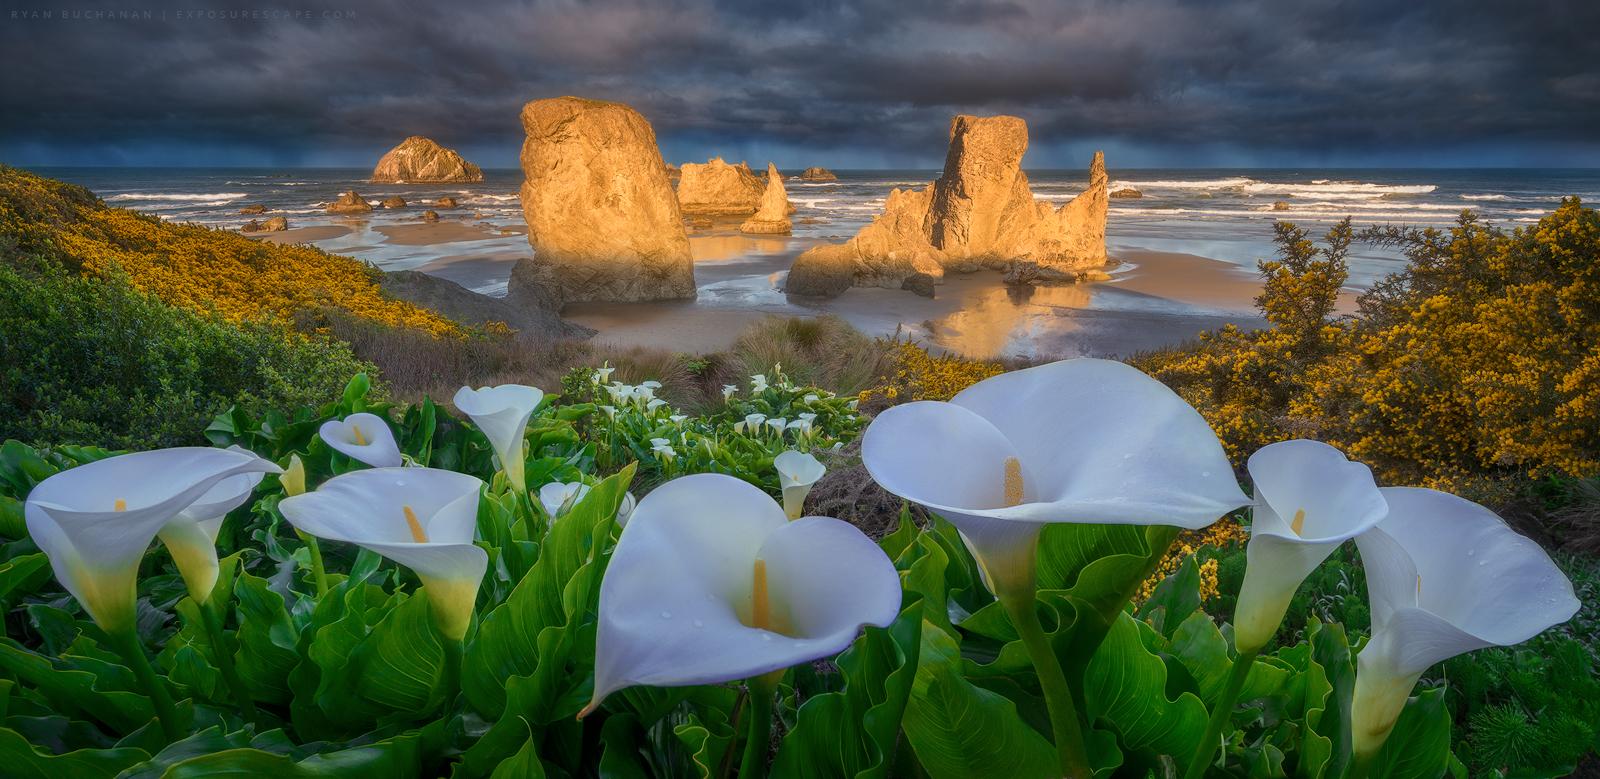 bandon beach seastacks and flowers at sunrise seascape